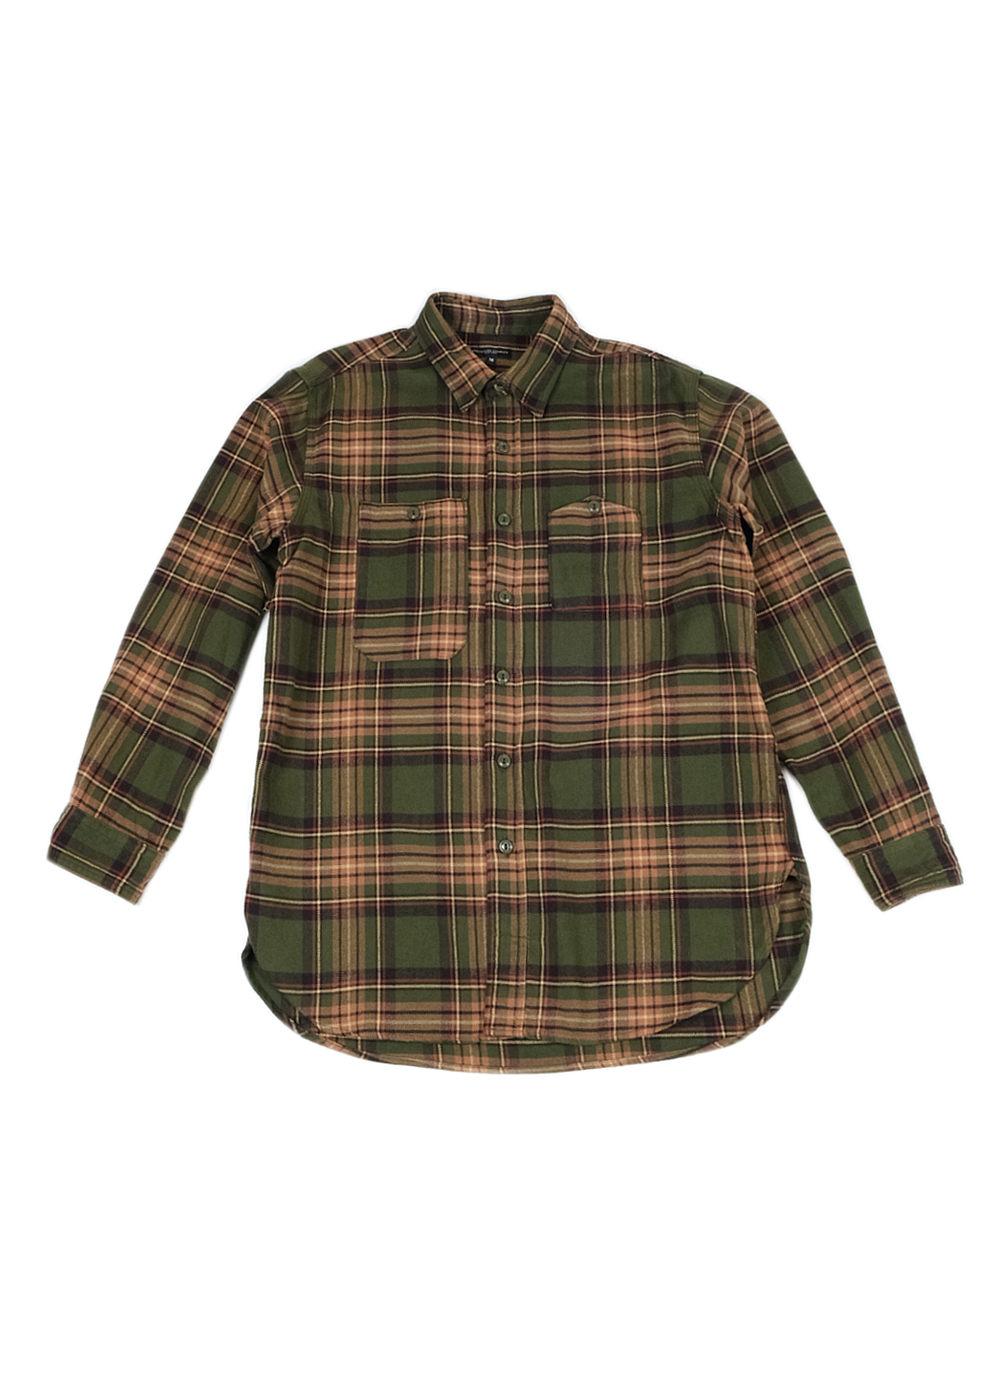 Engineered-Garments-Work-Shirt-Olive-Brown-Cotton-Twill-Plaid-01